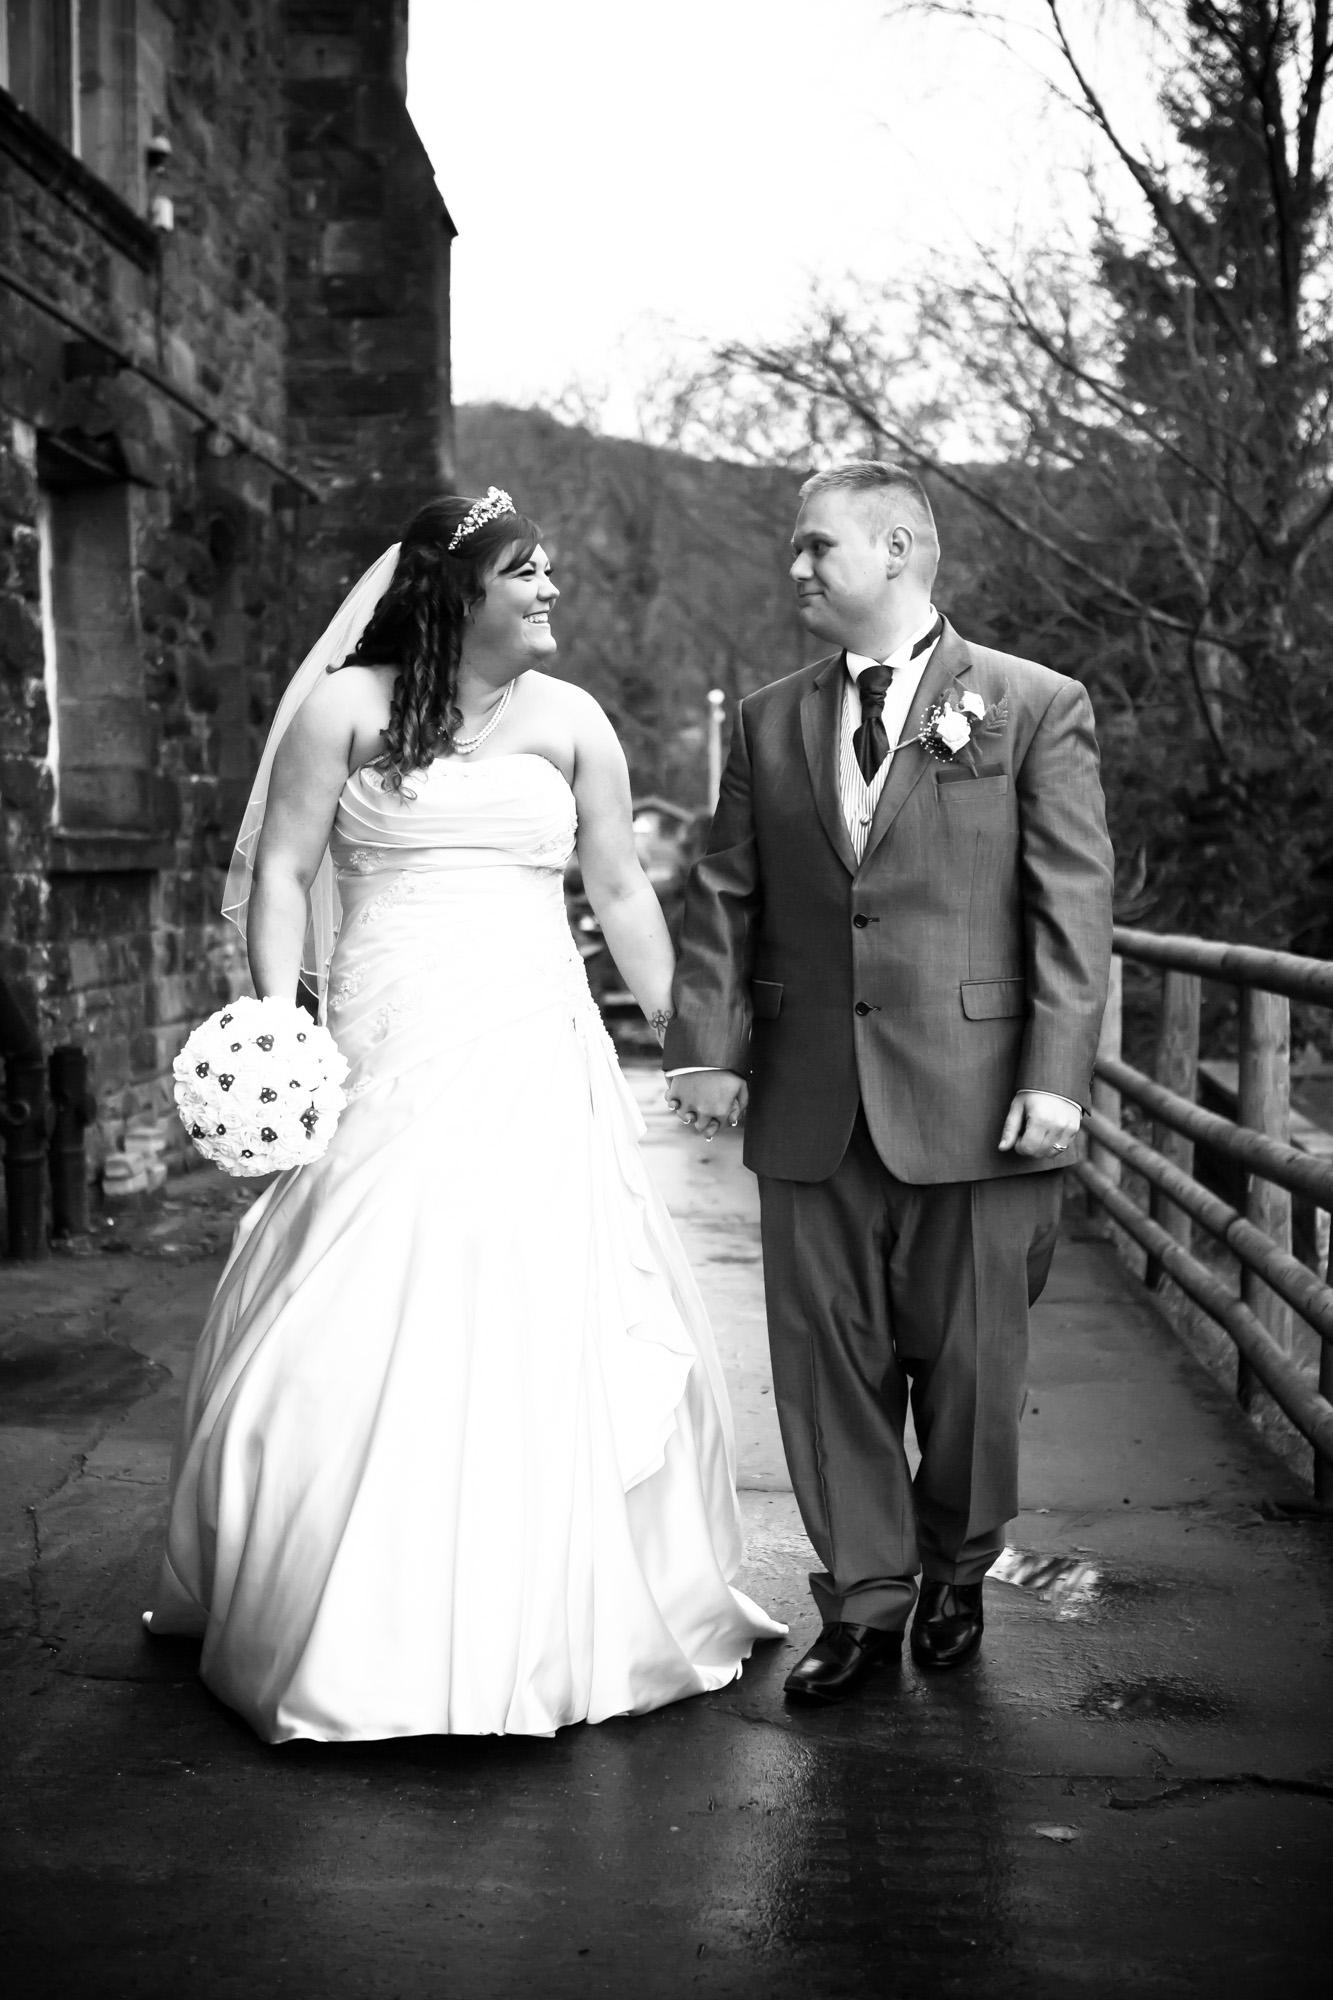 South Wales Wedding Photograher at Craig Y Nos Castle (27)